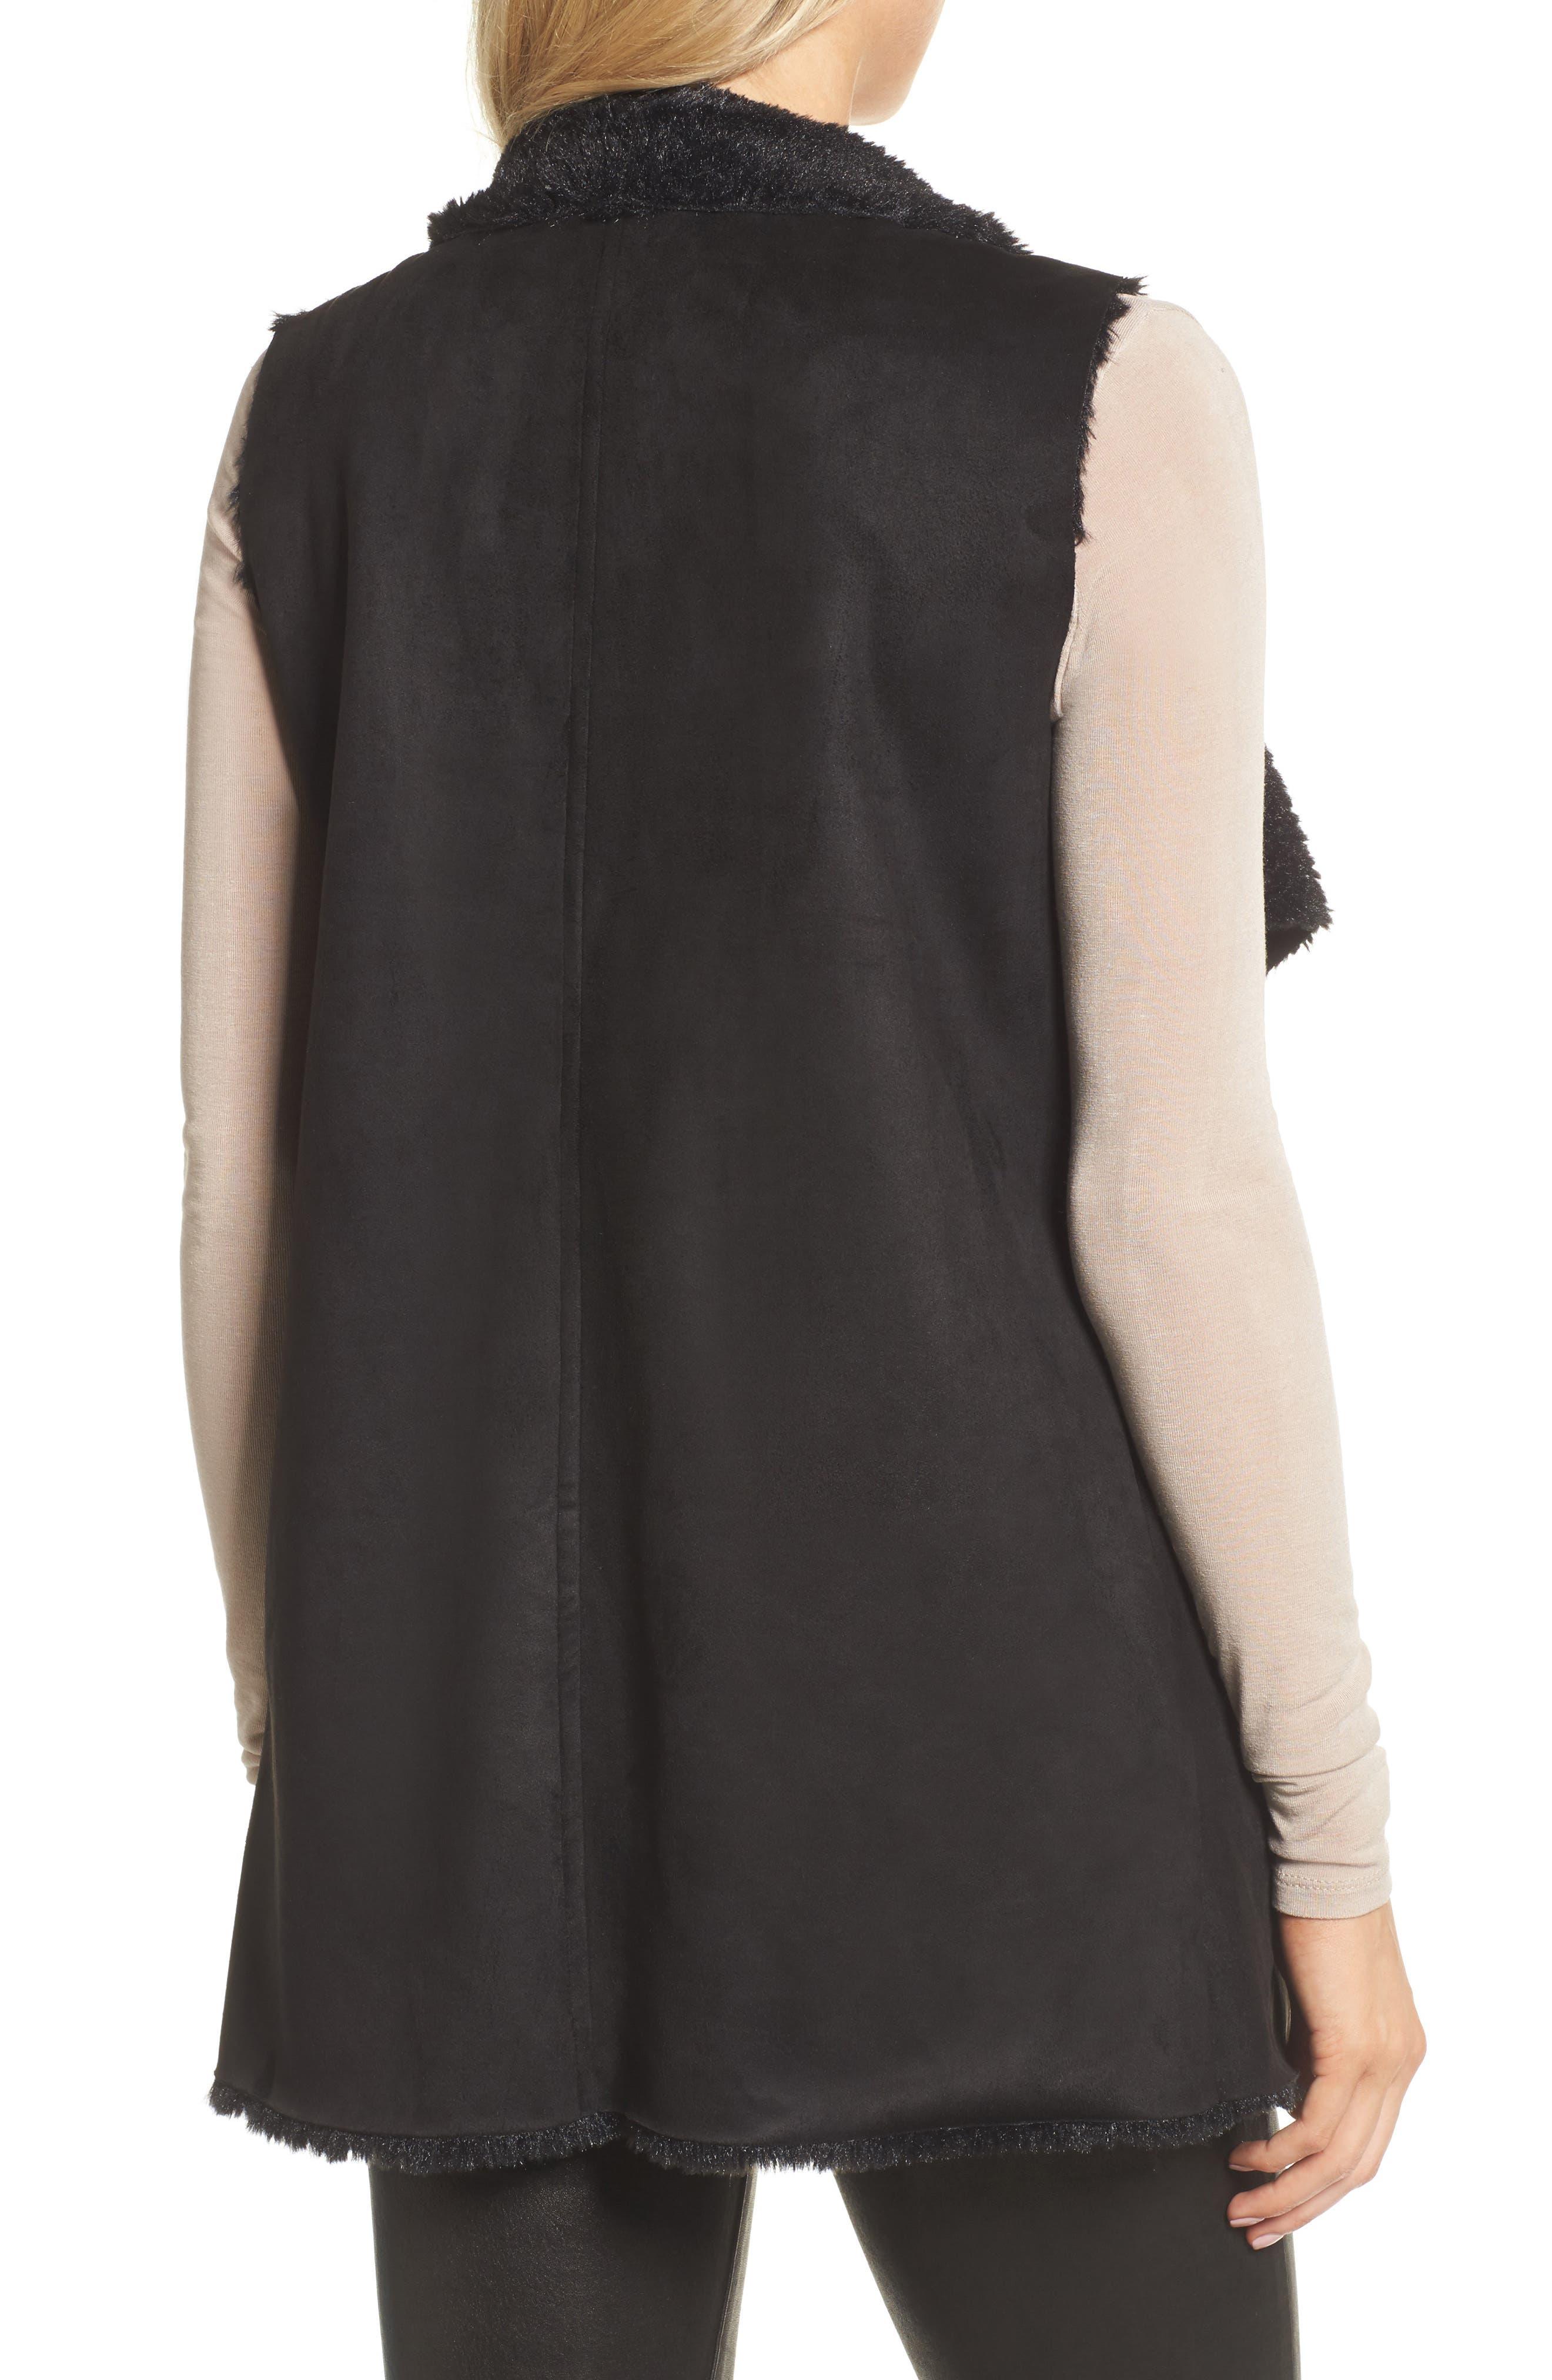 Avalonia Faux Shearling Vest,                             Alternate thumbnail 2, color,                             Black